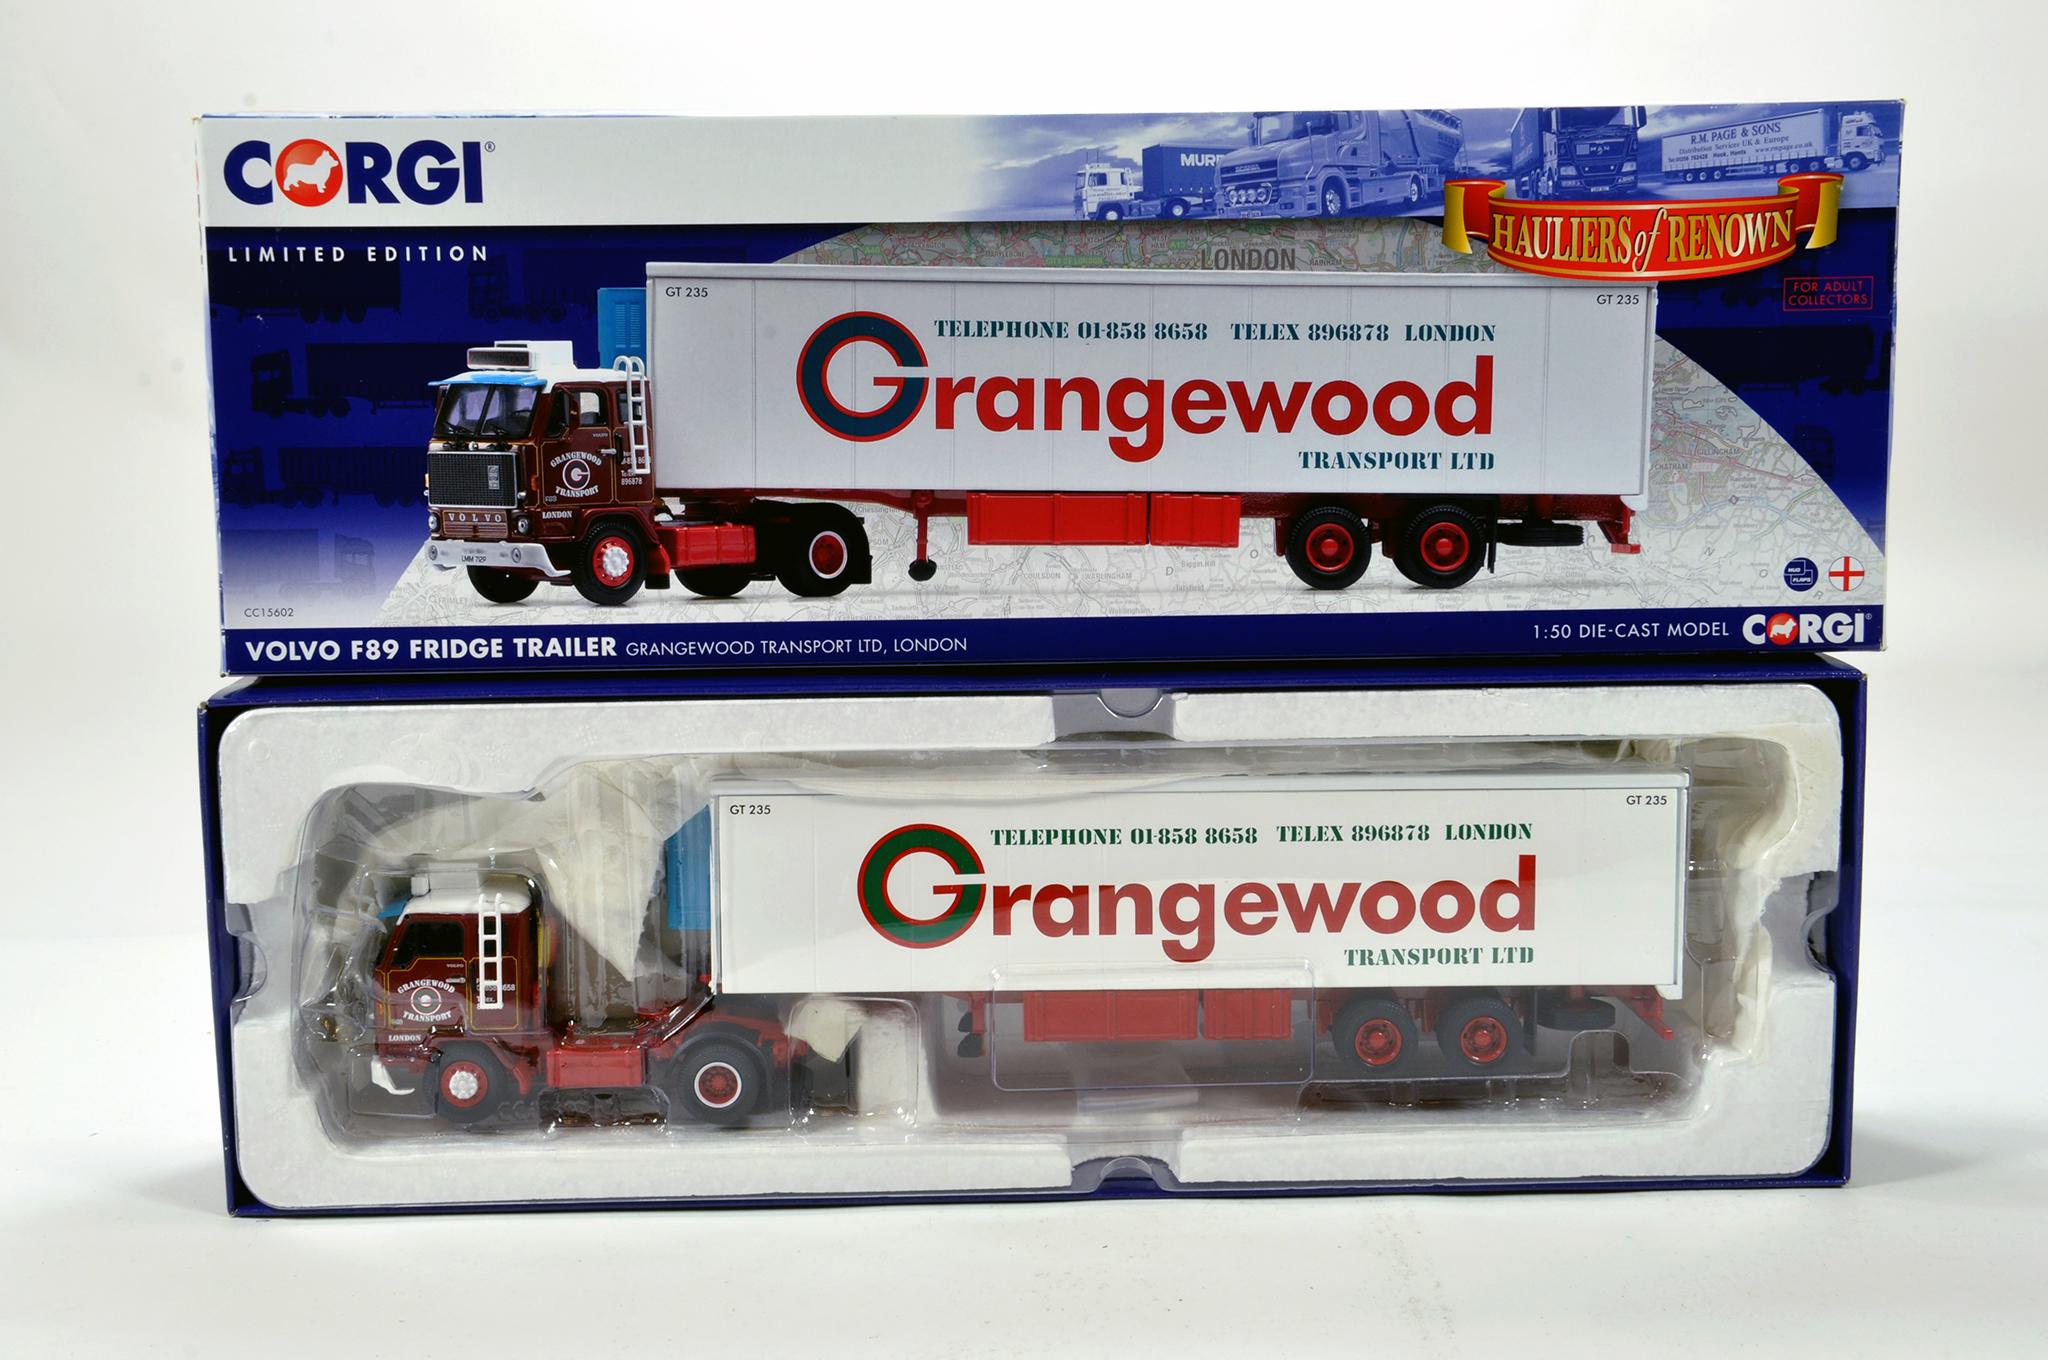 Lot 43 - Corgi 1/50 diecast truck issue comprising No. CC15602 Volvo F89 Fridge Trailer in livery of